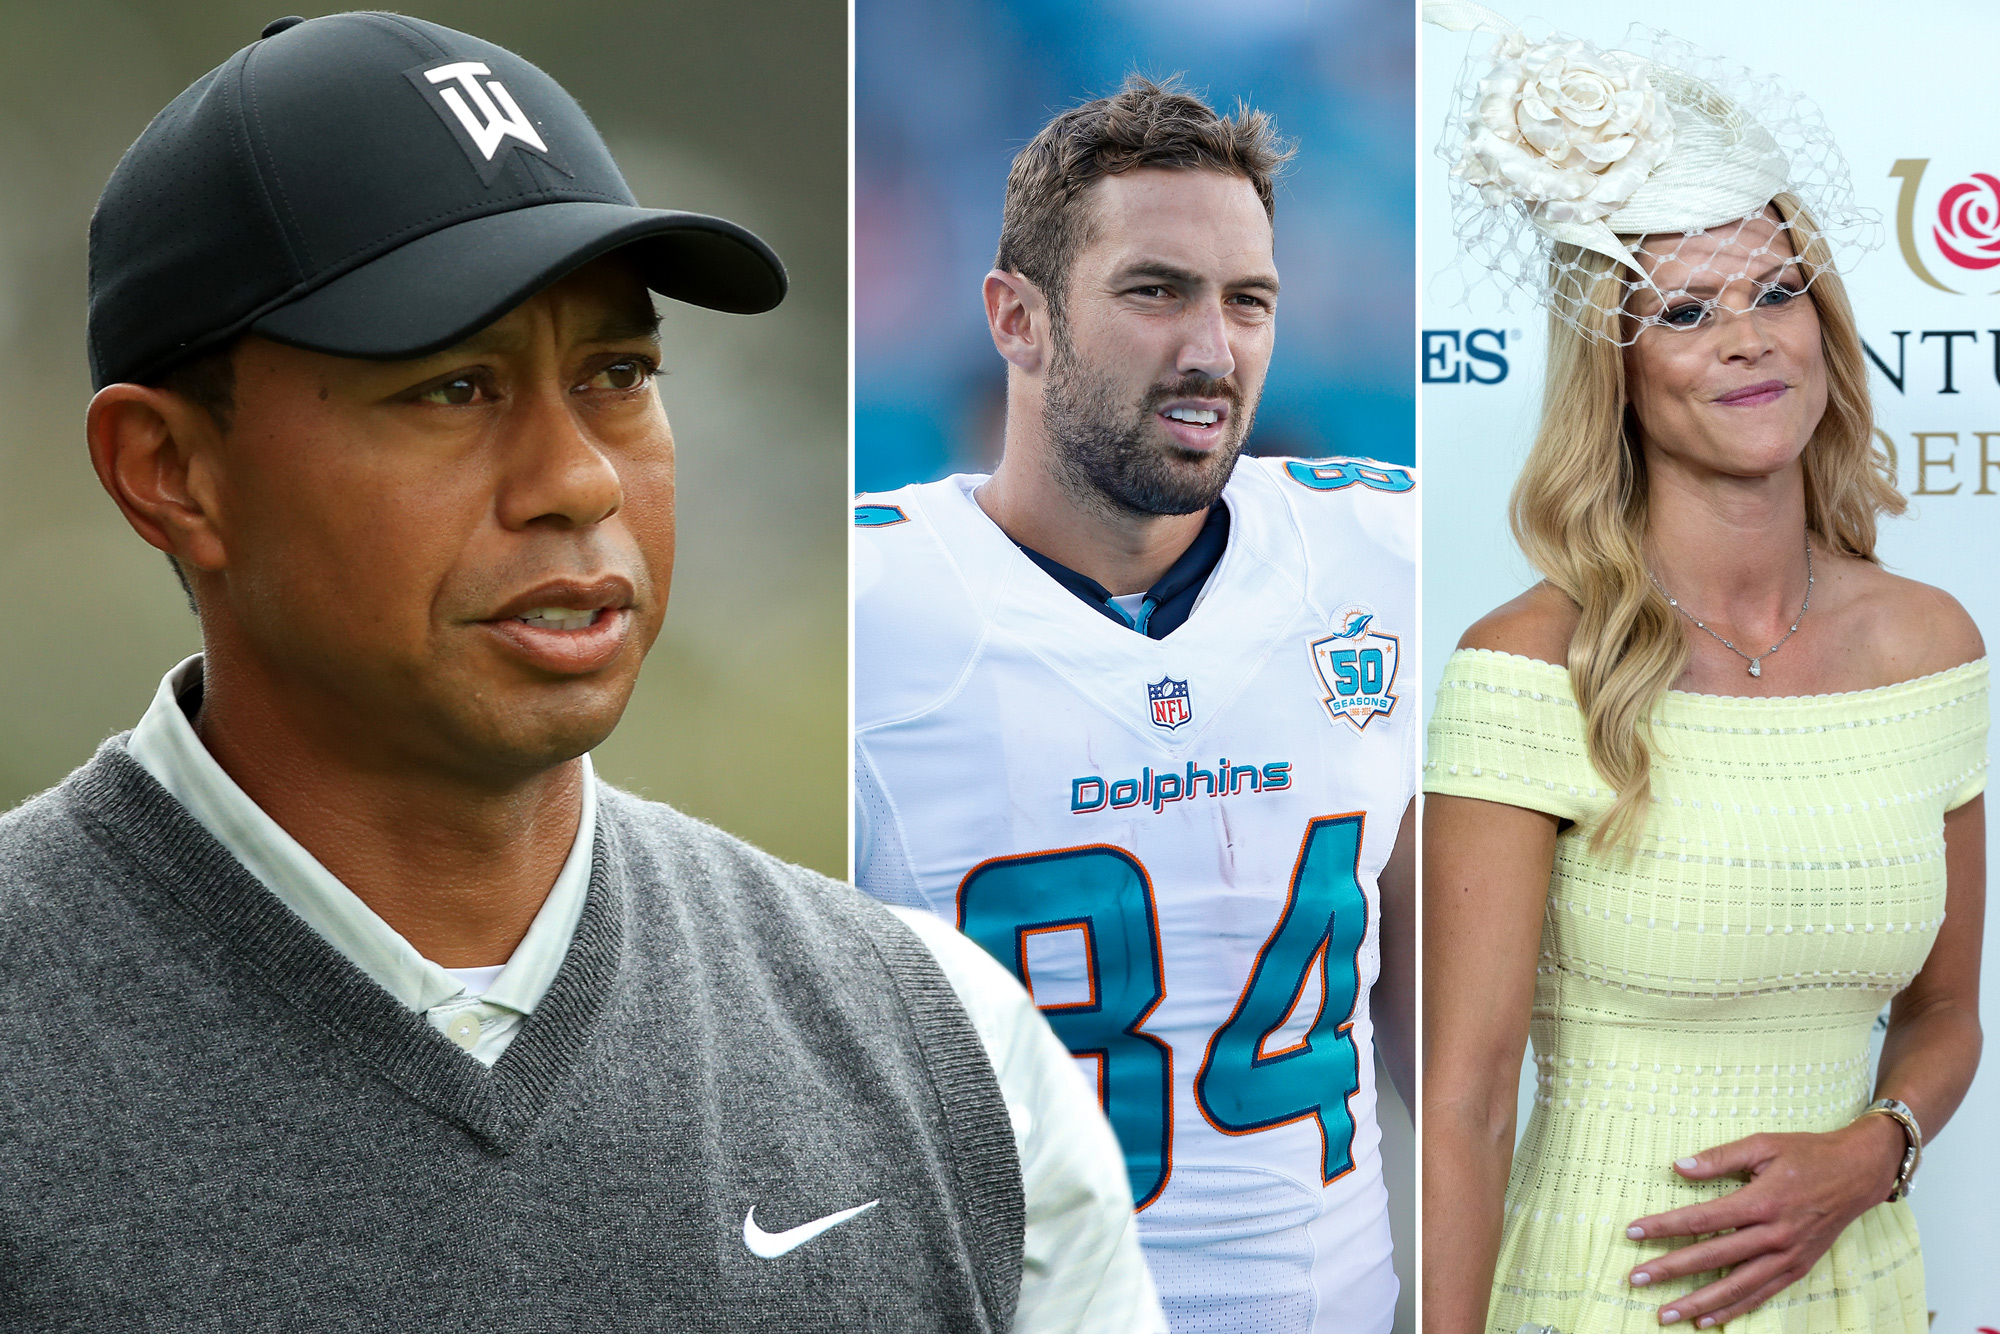 Tiger Woods' ex Elin Nordegren expecting child with Jordan Cameron